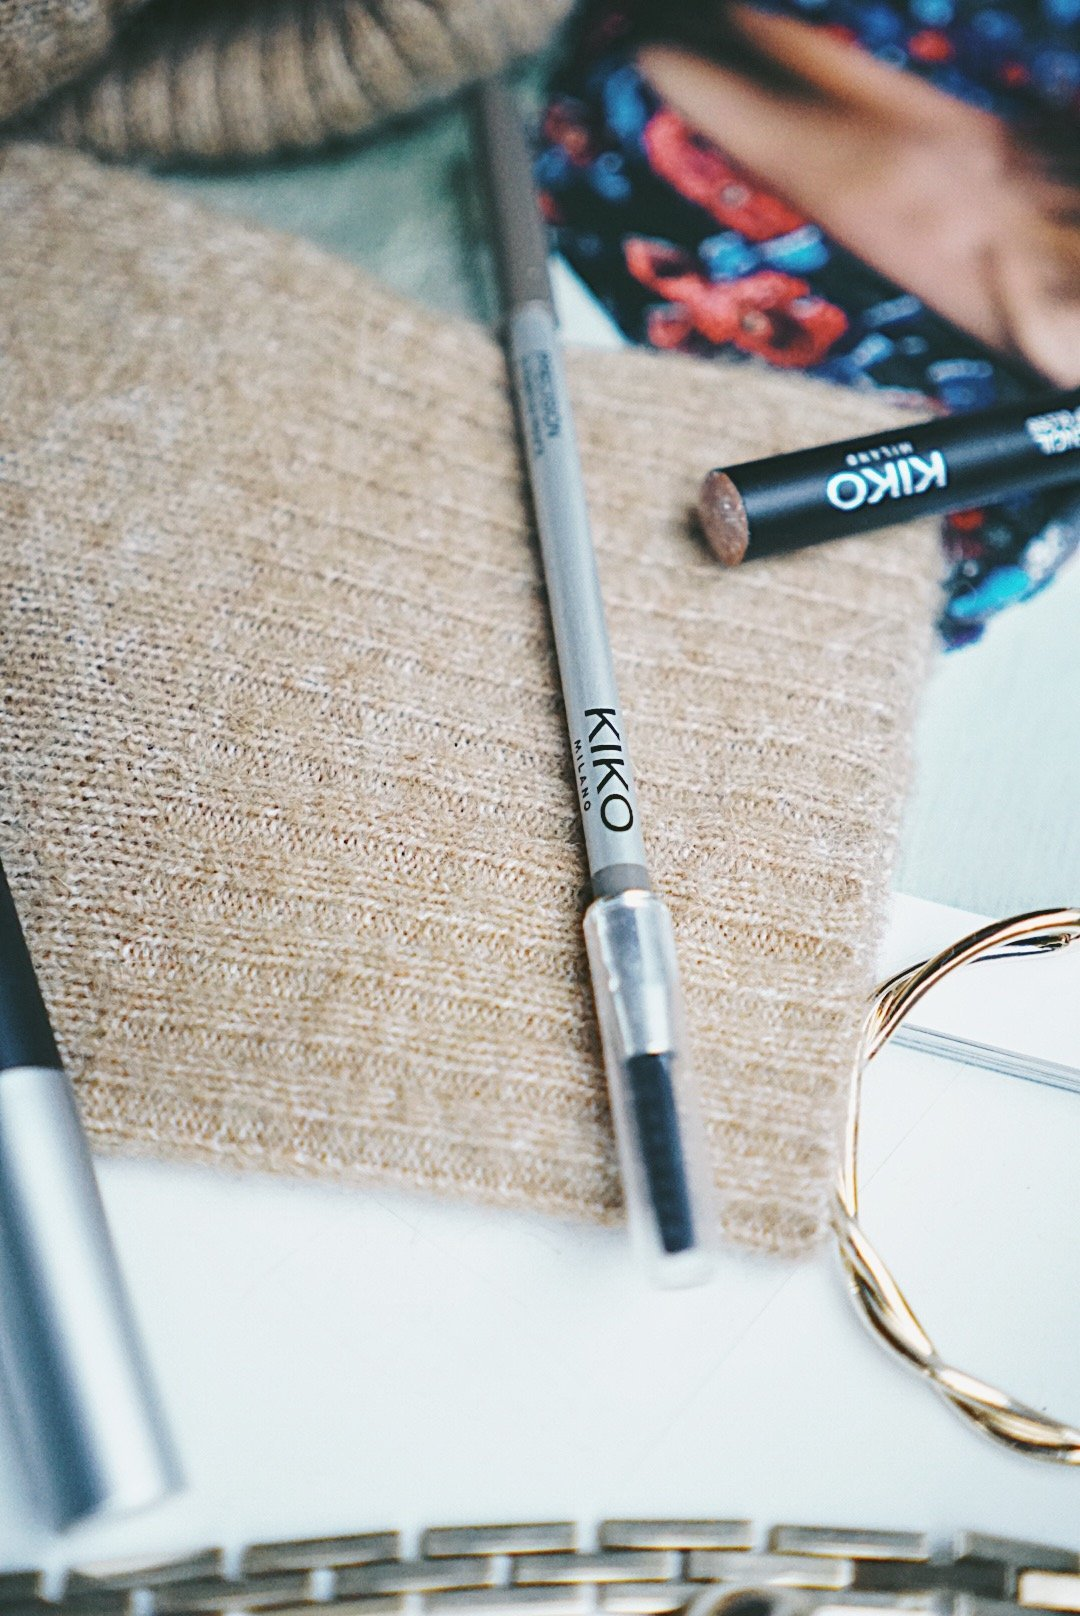 Precision_Eyebrow_Pencil_Kiko-Augenbrauen_schminken-Nowshine-Beauty-Blog-ü40